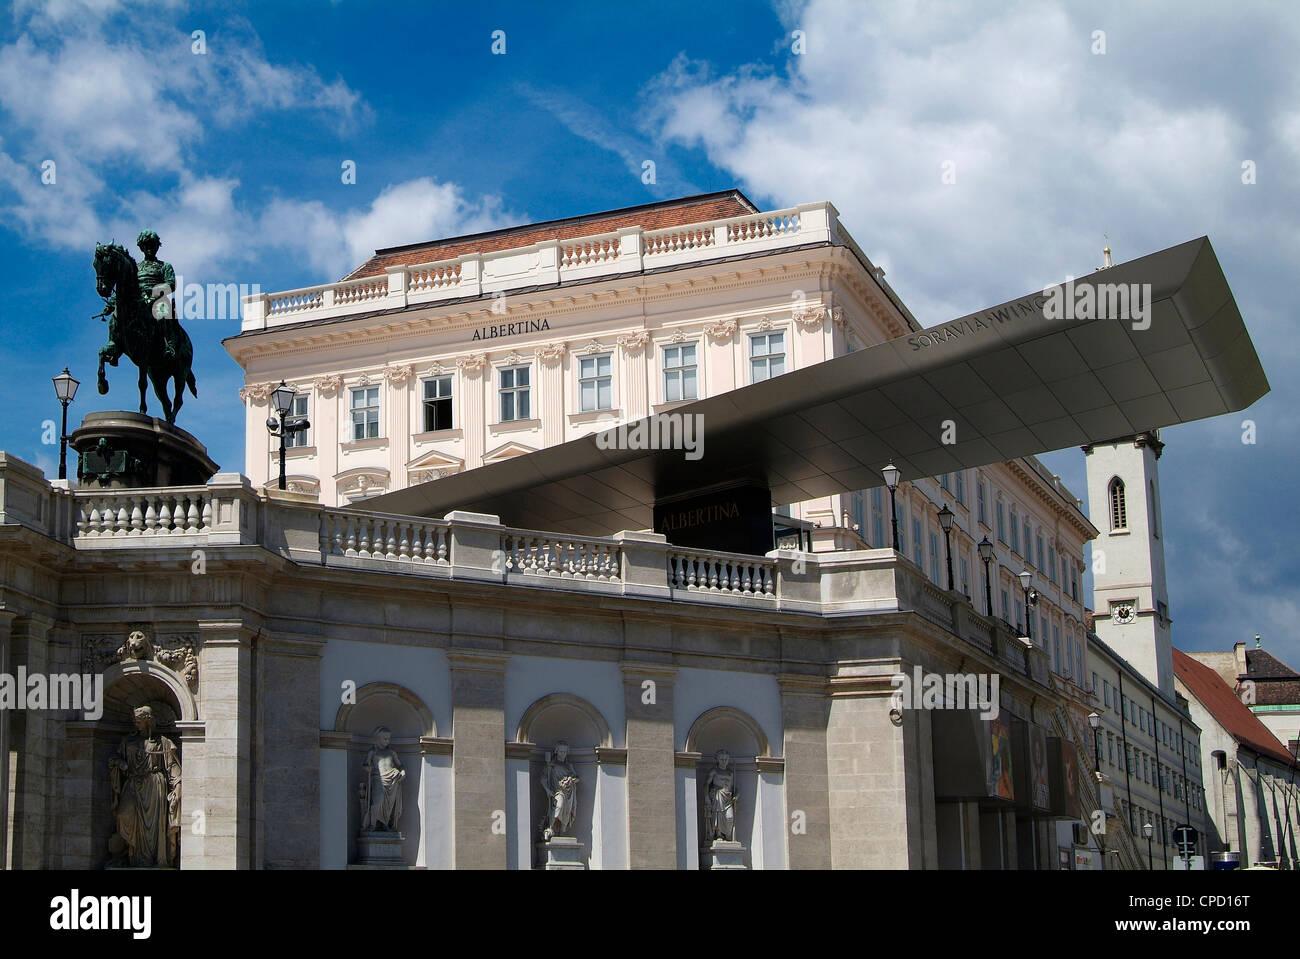 Albertina, Vienna, Austria, Europe - Stock Image